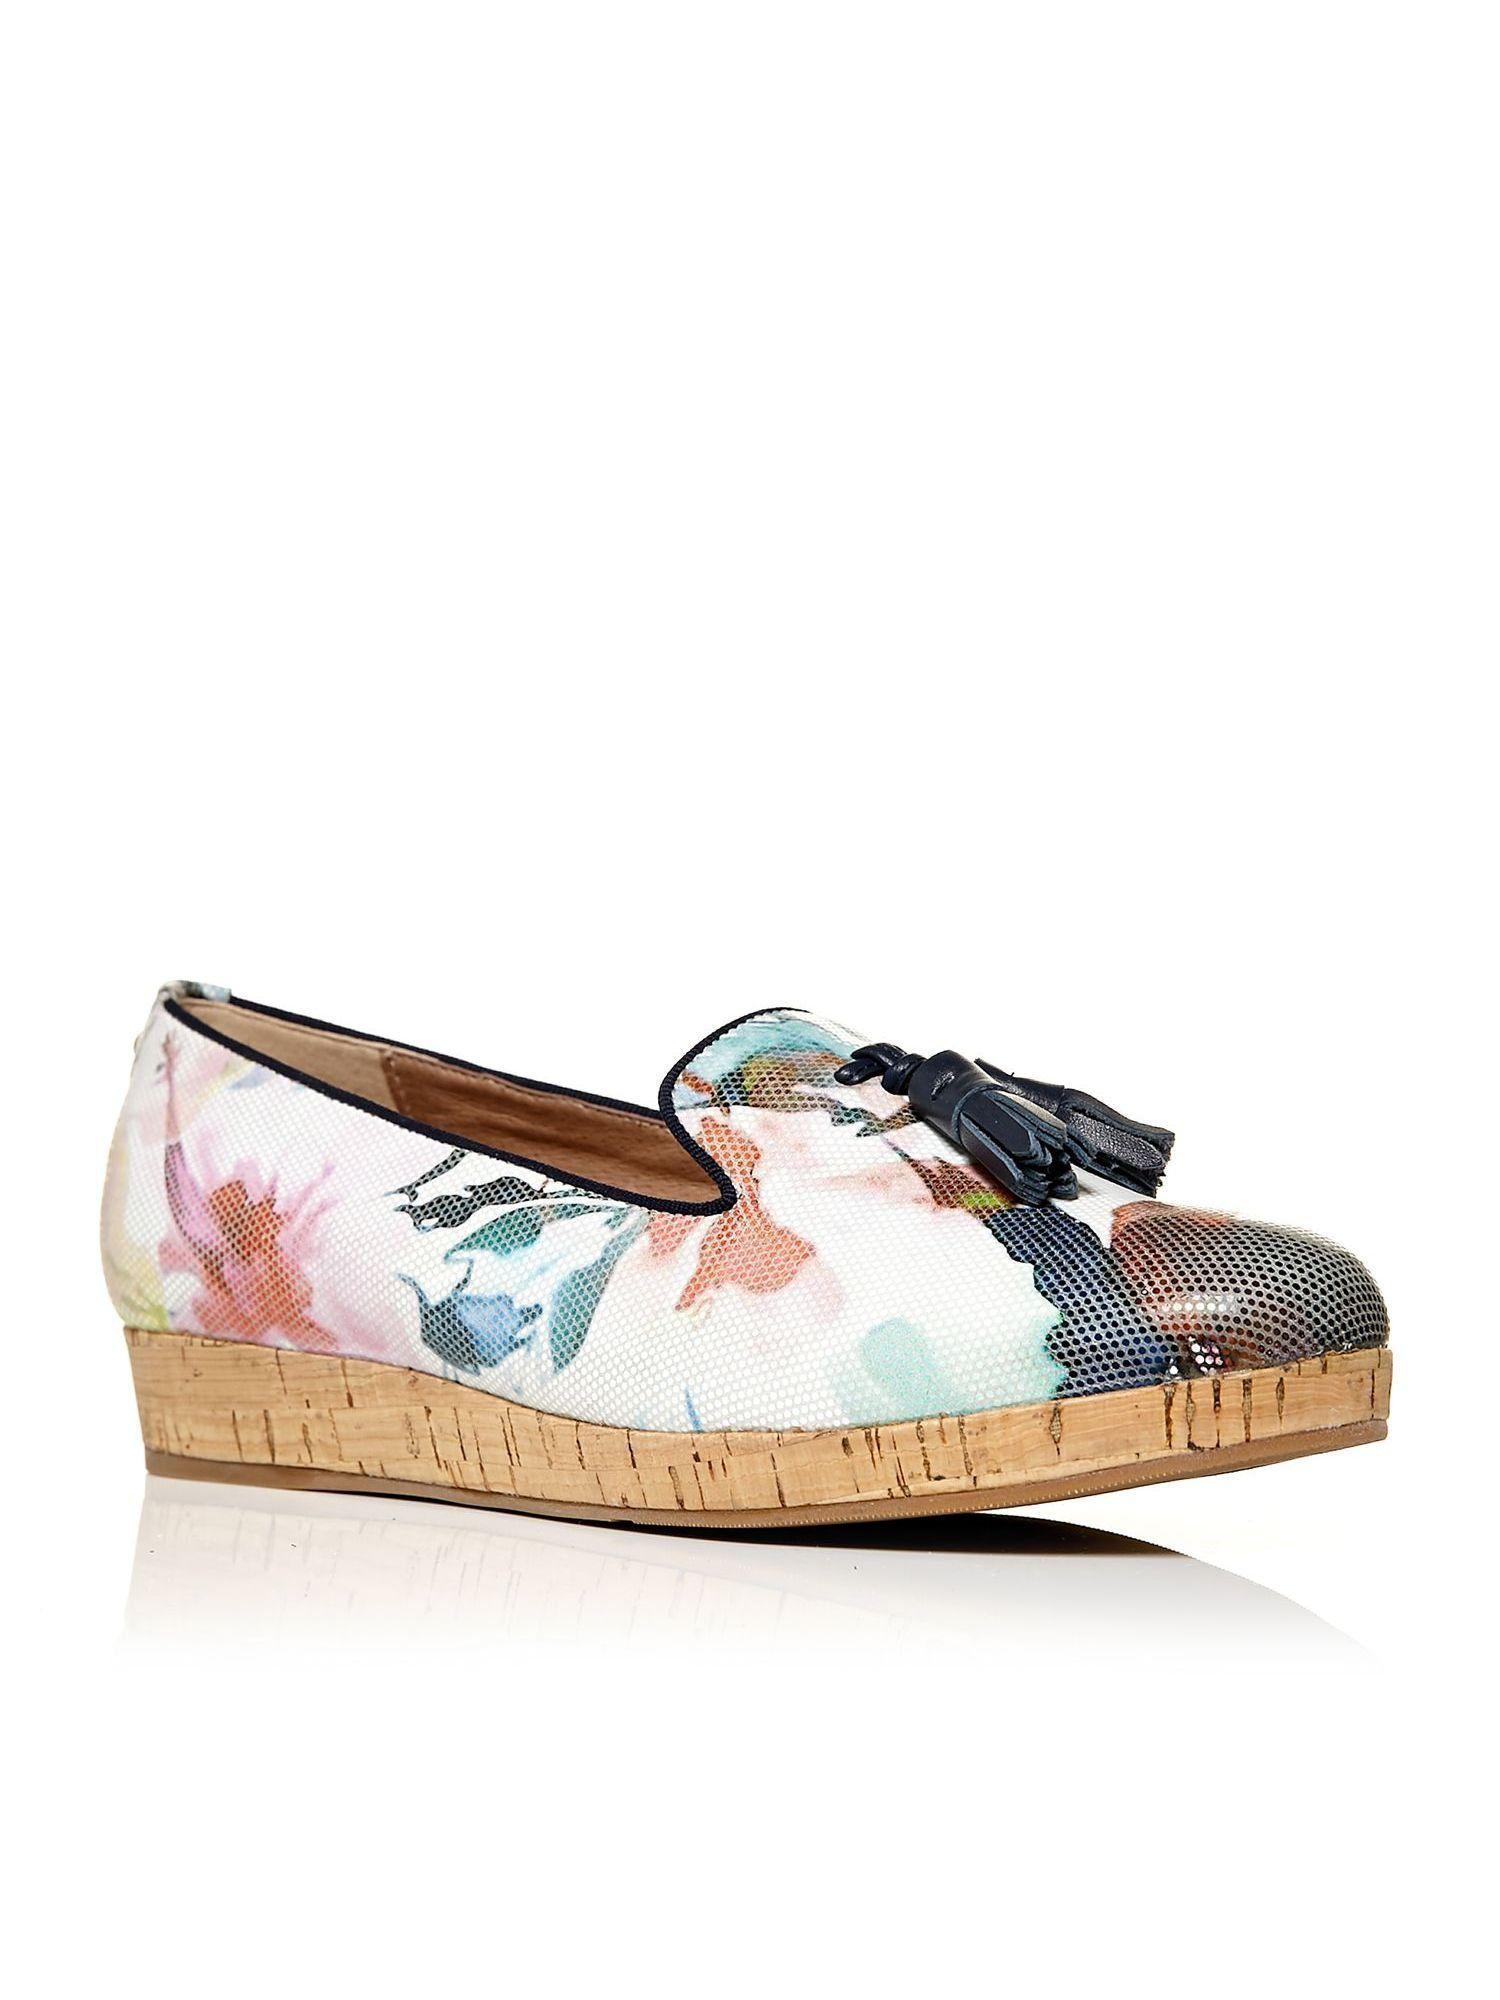 Moda in Pelle Estana cork sole slippers, Multi-Coloured